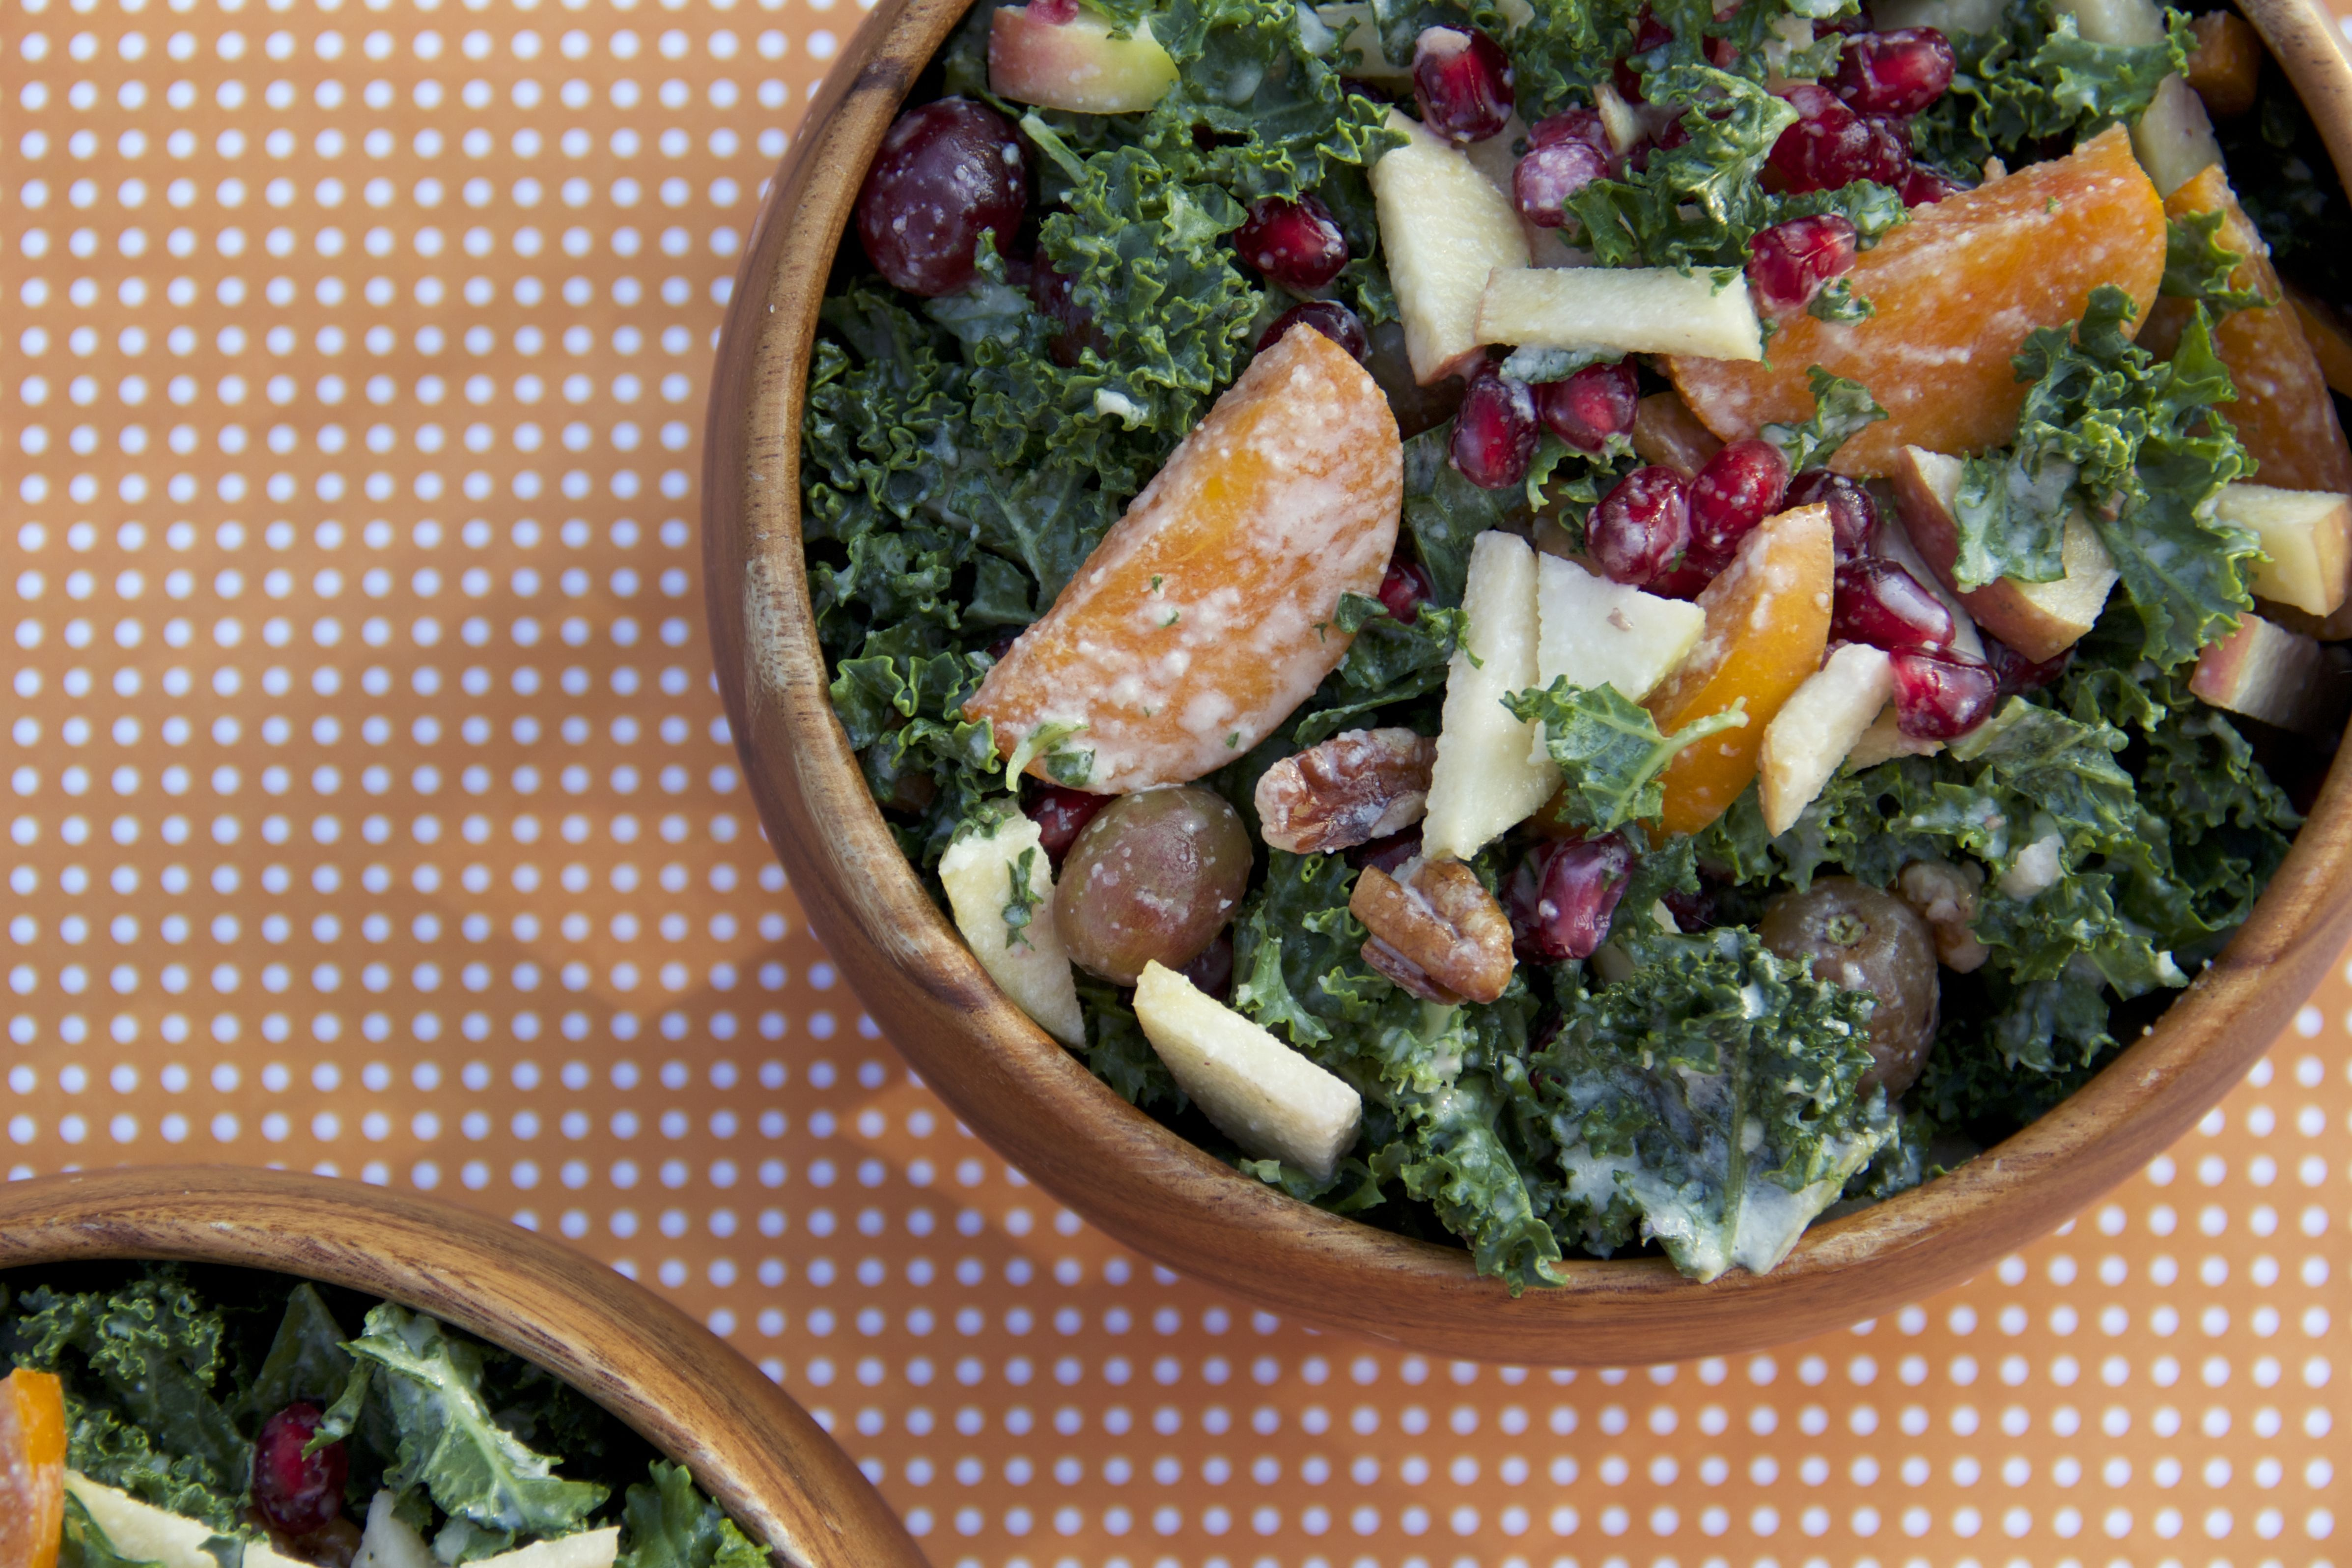 Persimmon Salad With Sesame Vinaigrette Recipes — Dishmaps